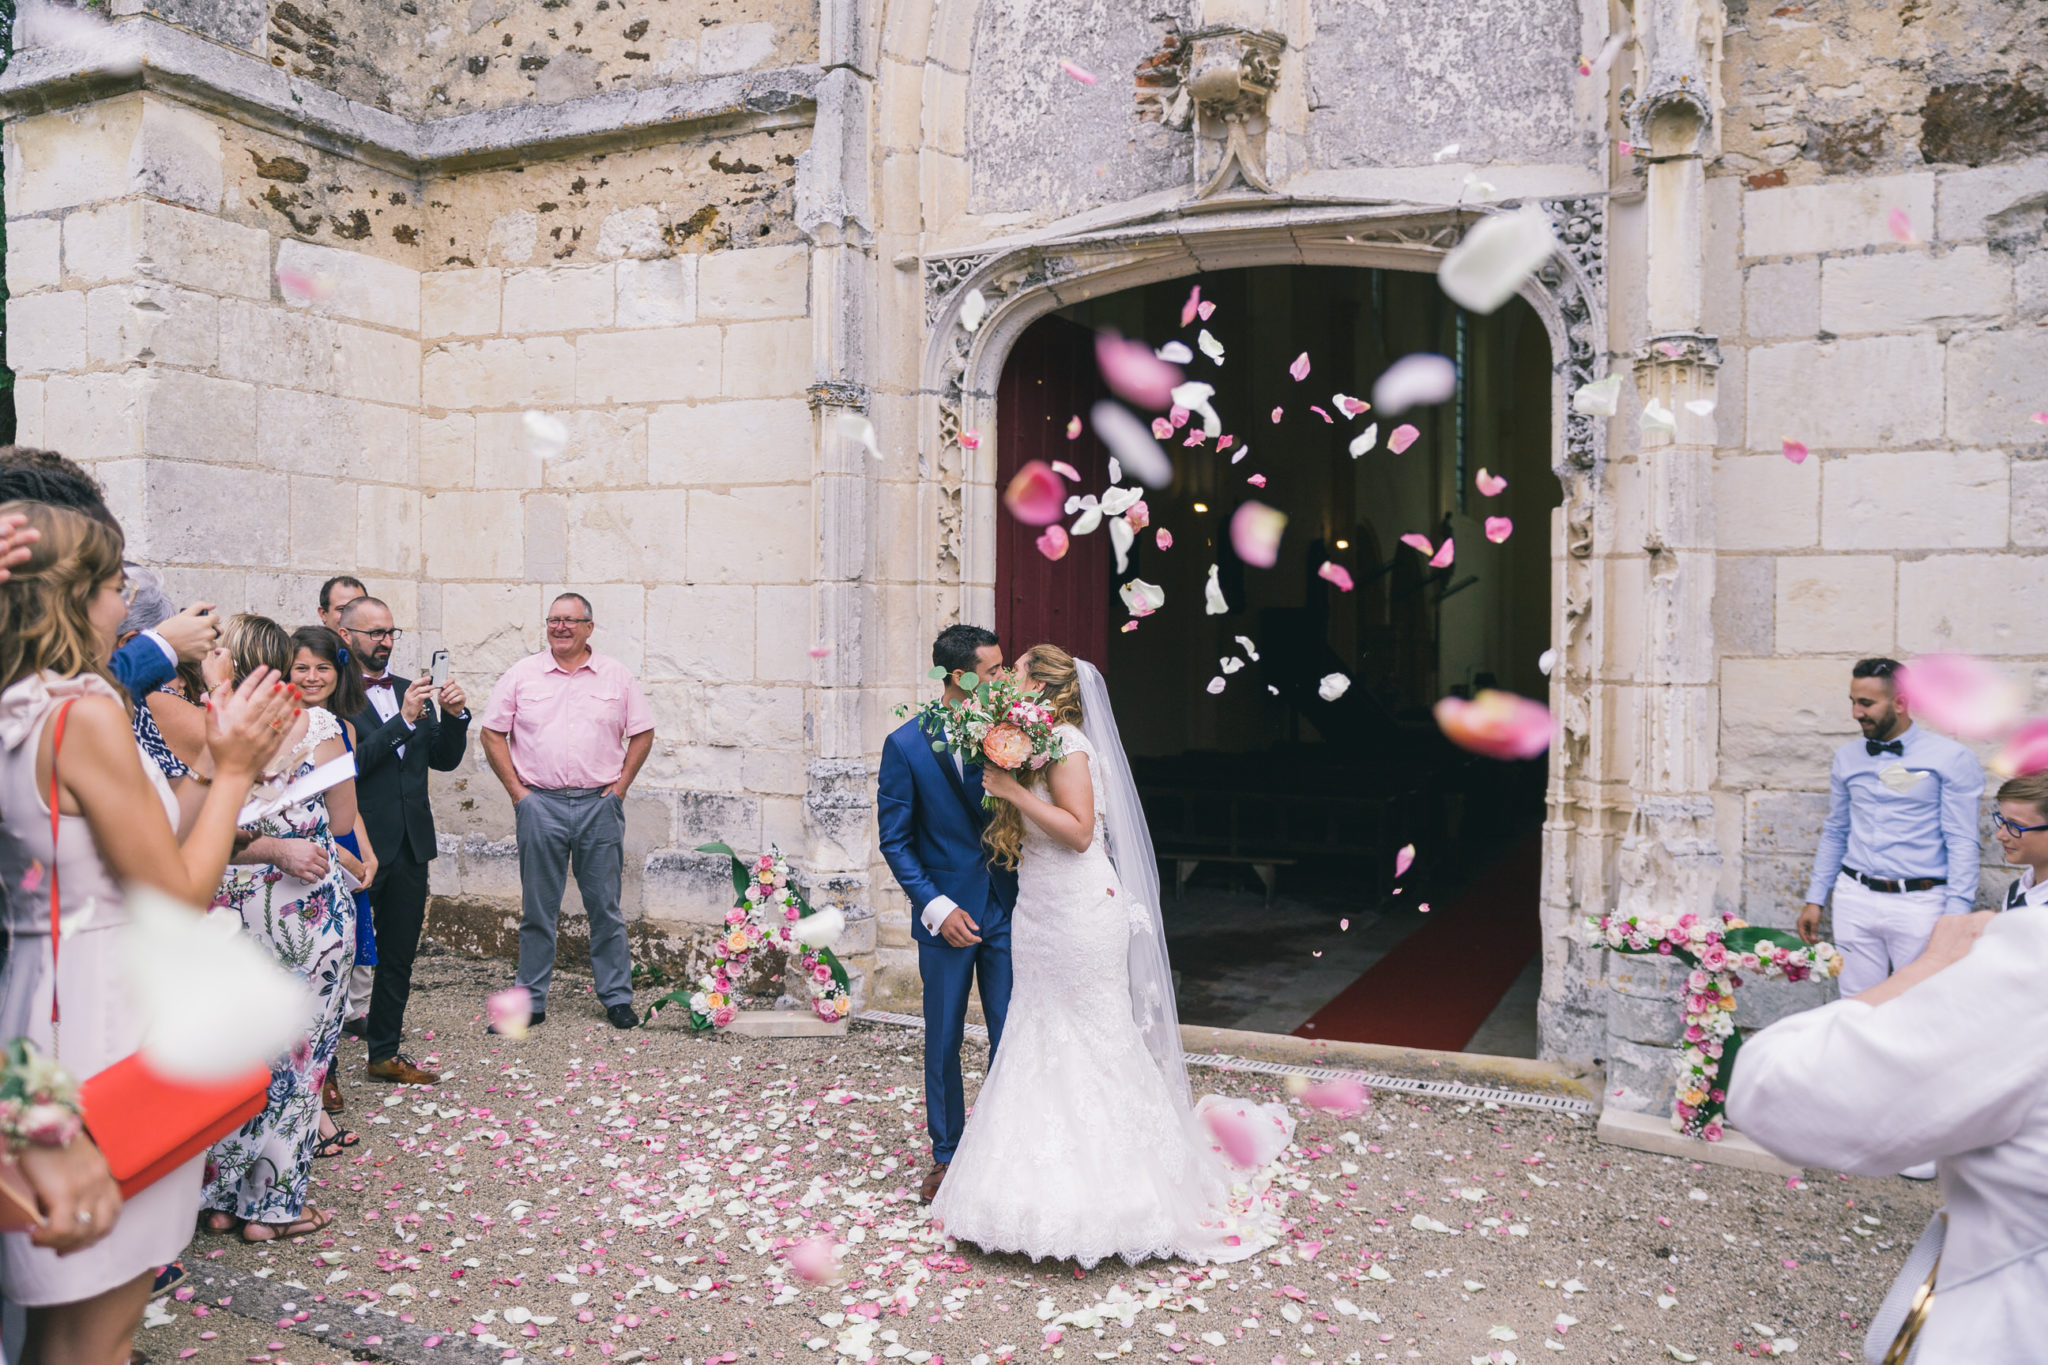 photographe de mariage Yonne bourgogne burgundy wedding